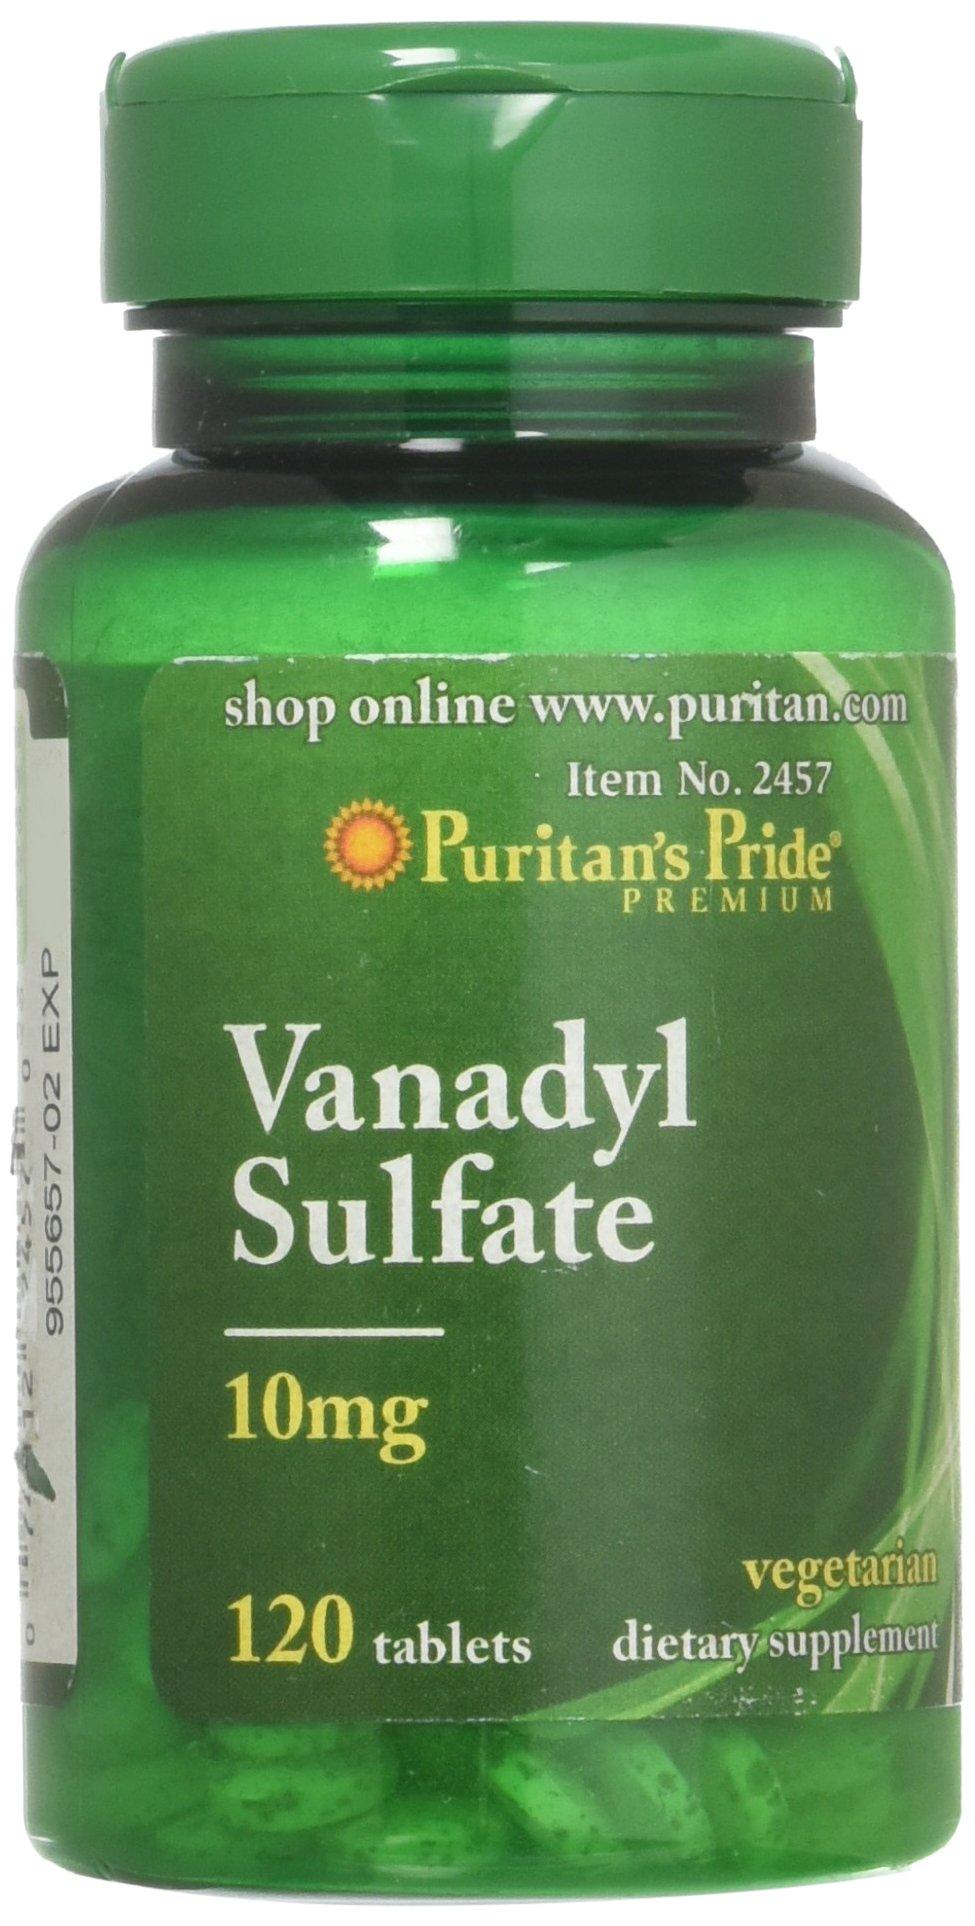 Puritans Pride Vanadyl Sulfate 10 mg-120 Tablets